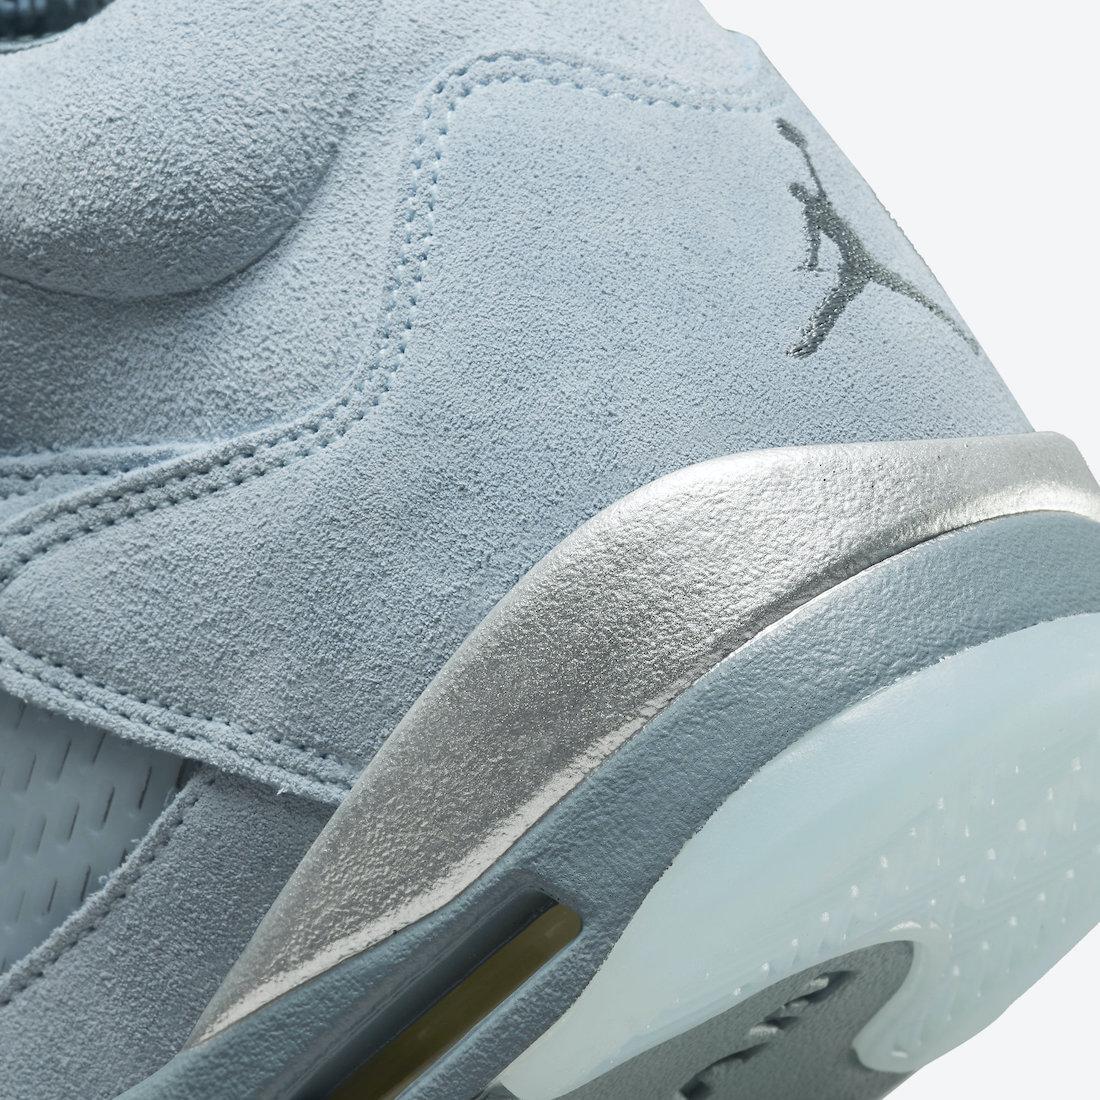 Air-Jordan-5-Bluebird-Photo-Blue-DD9336-400-Release-Date-Price-7